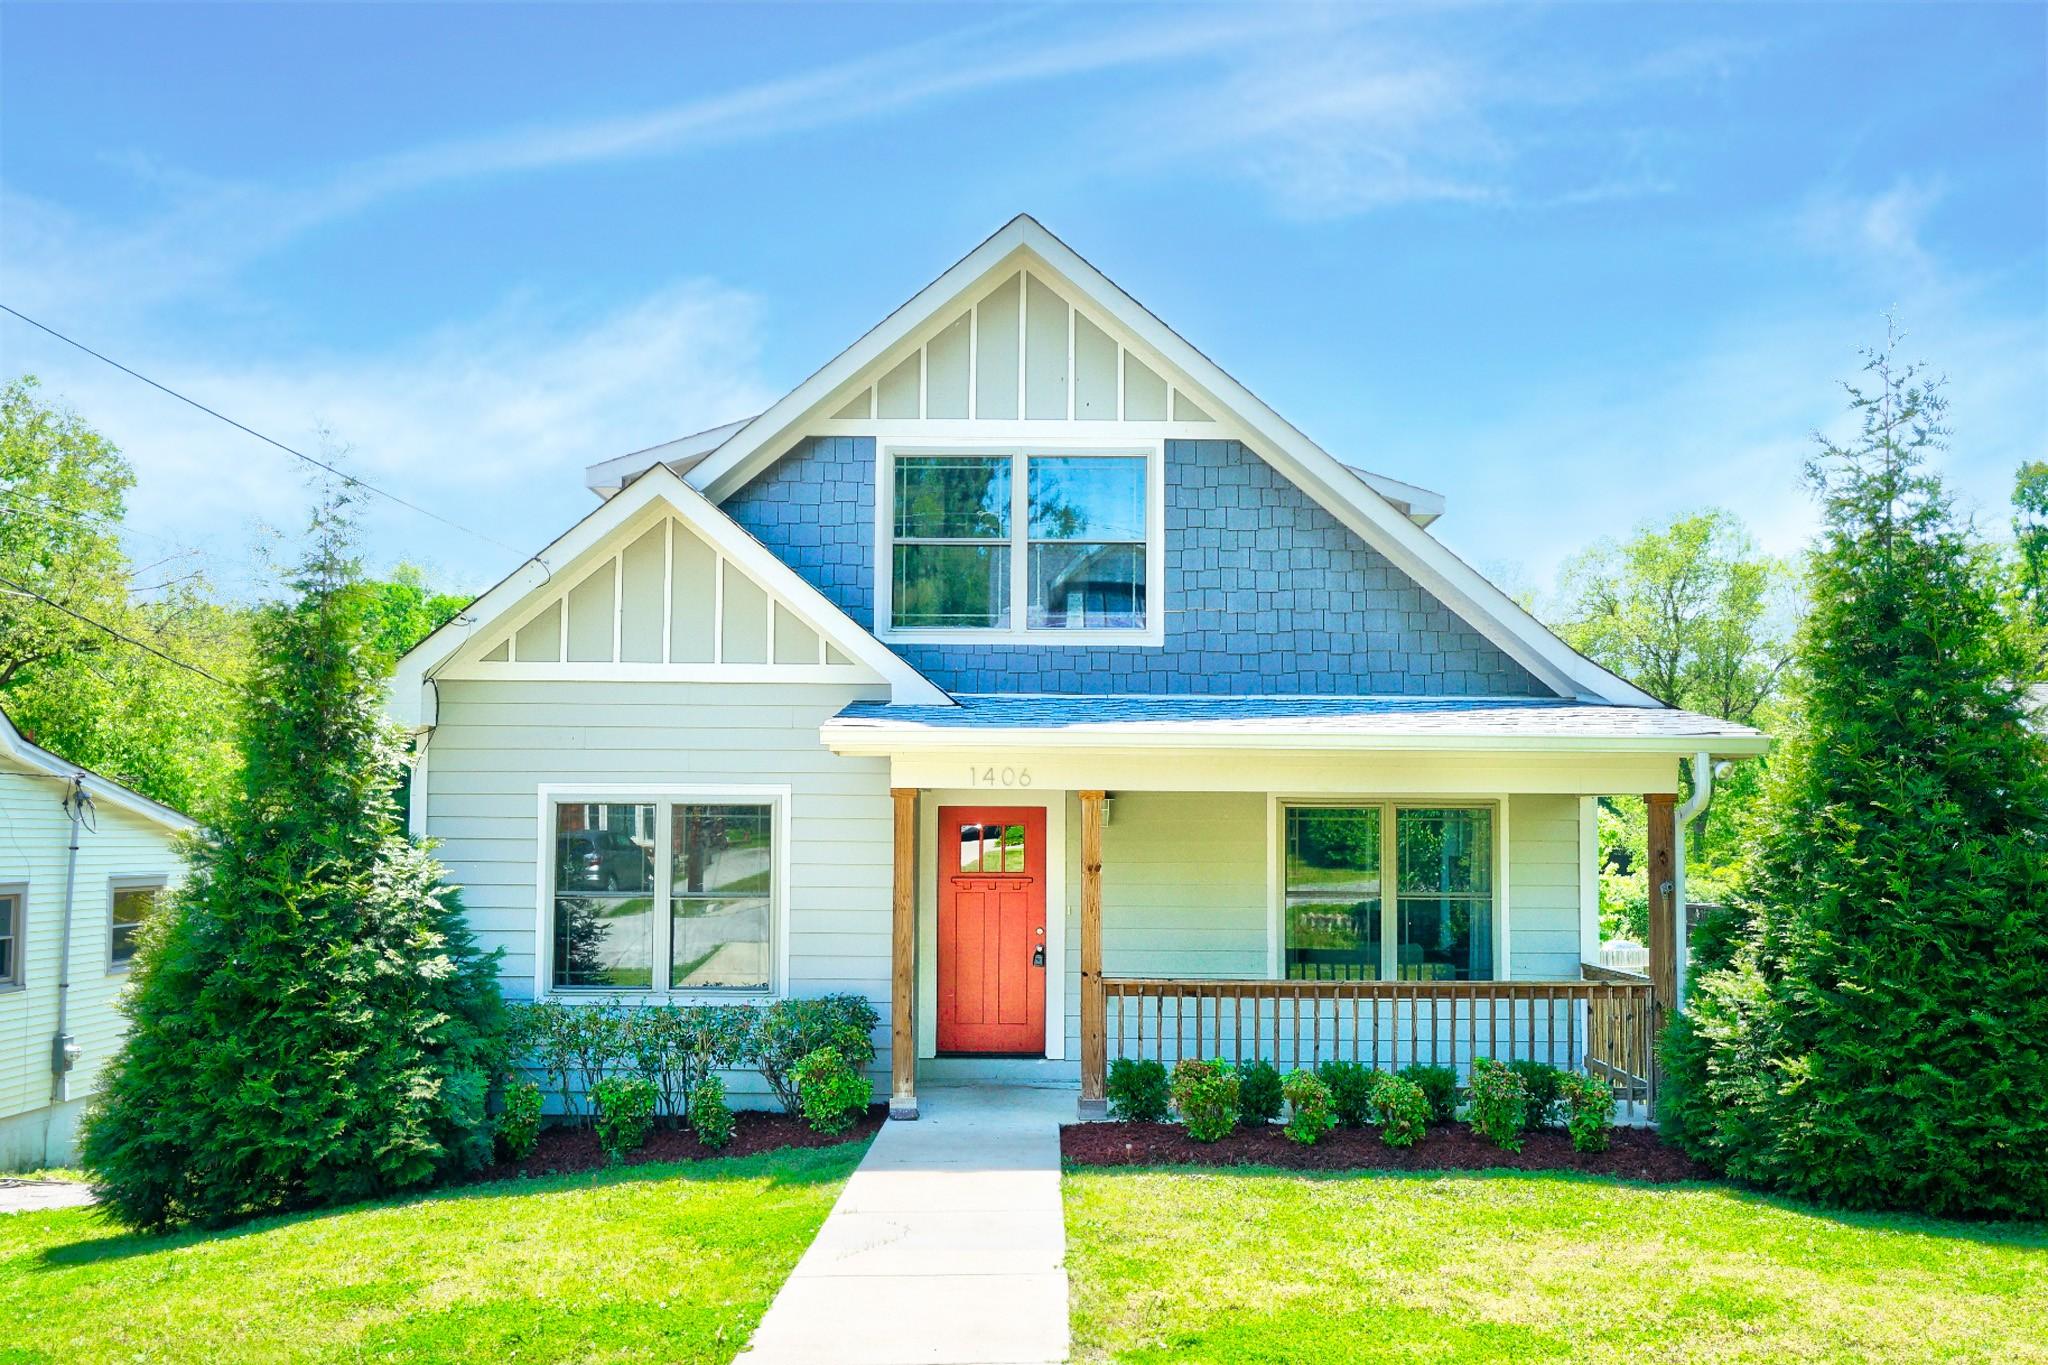 1406 Norvel Ave, Nashville, TN 37216 - Nashville, TN real estate listing